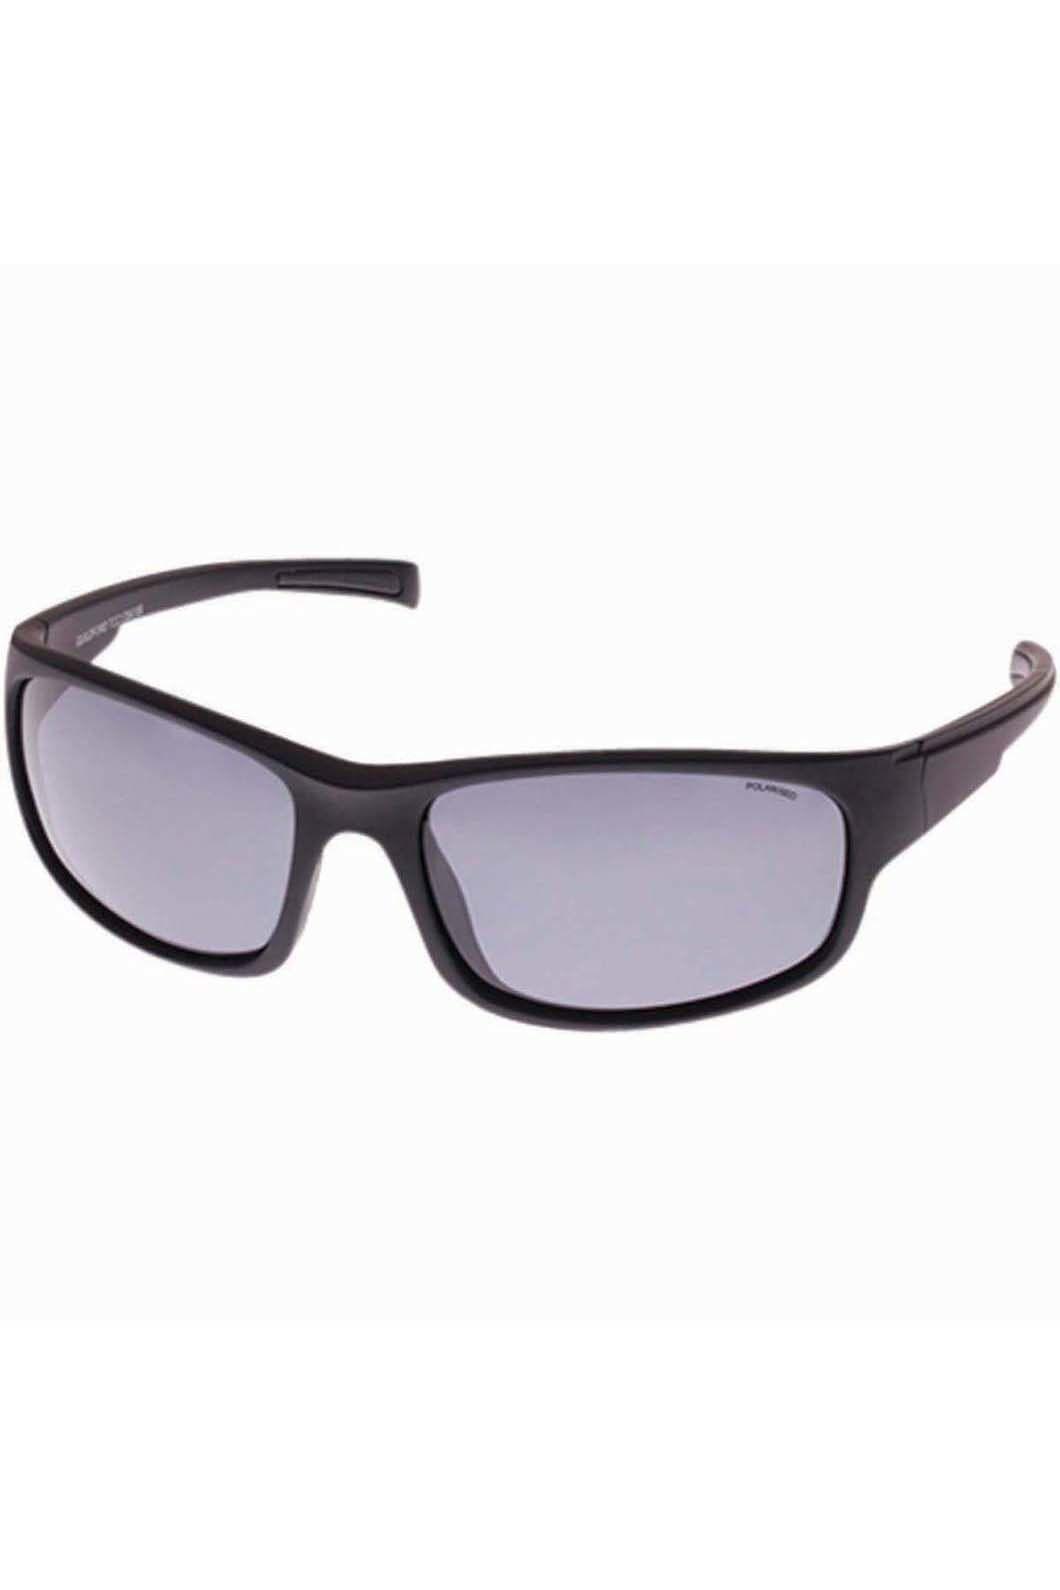 Cancer Council Men's Guildford Sunglasse, Black, hi-res